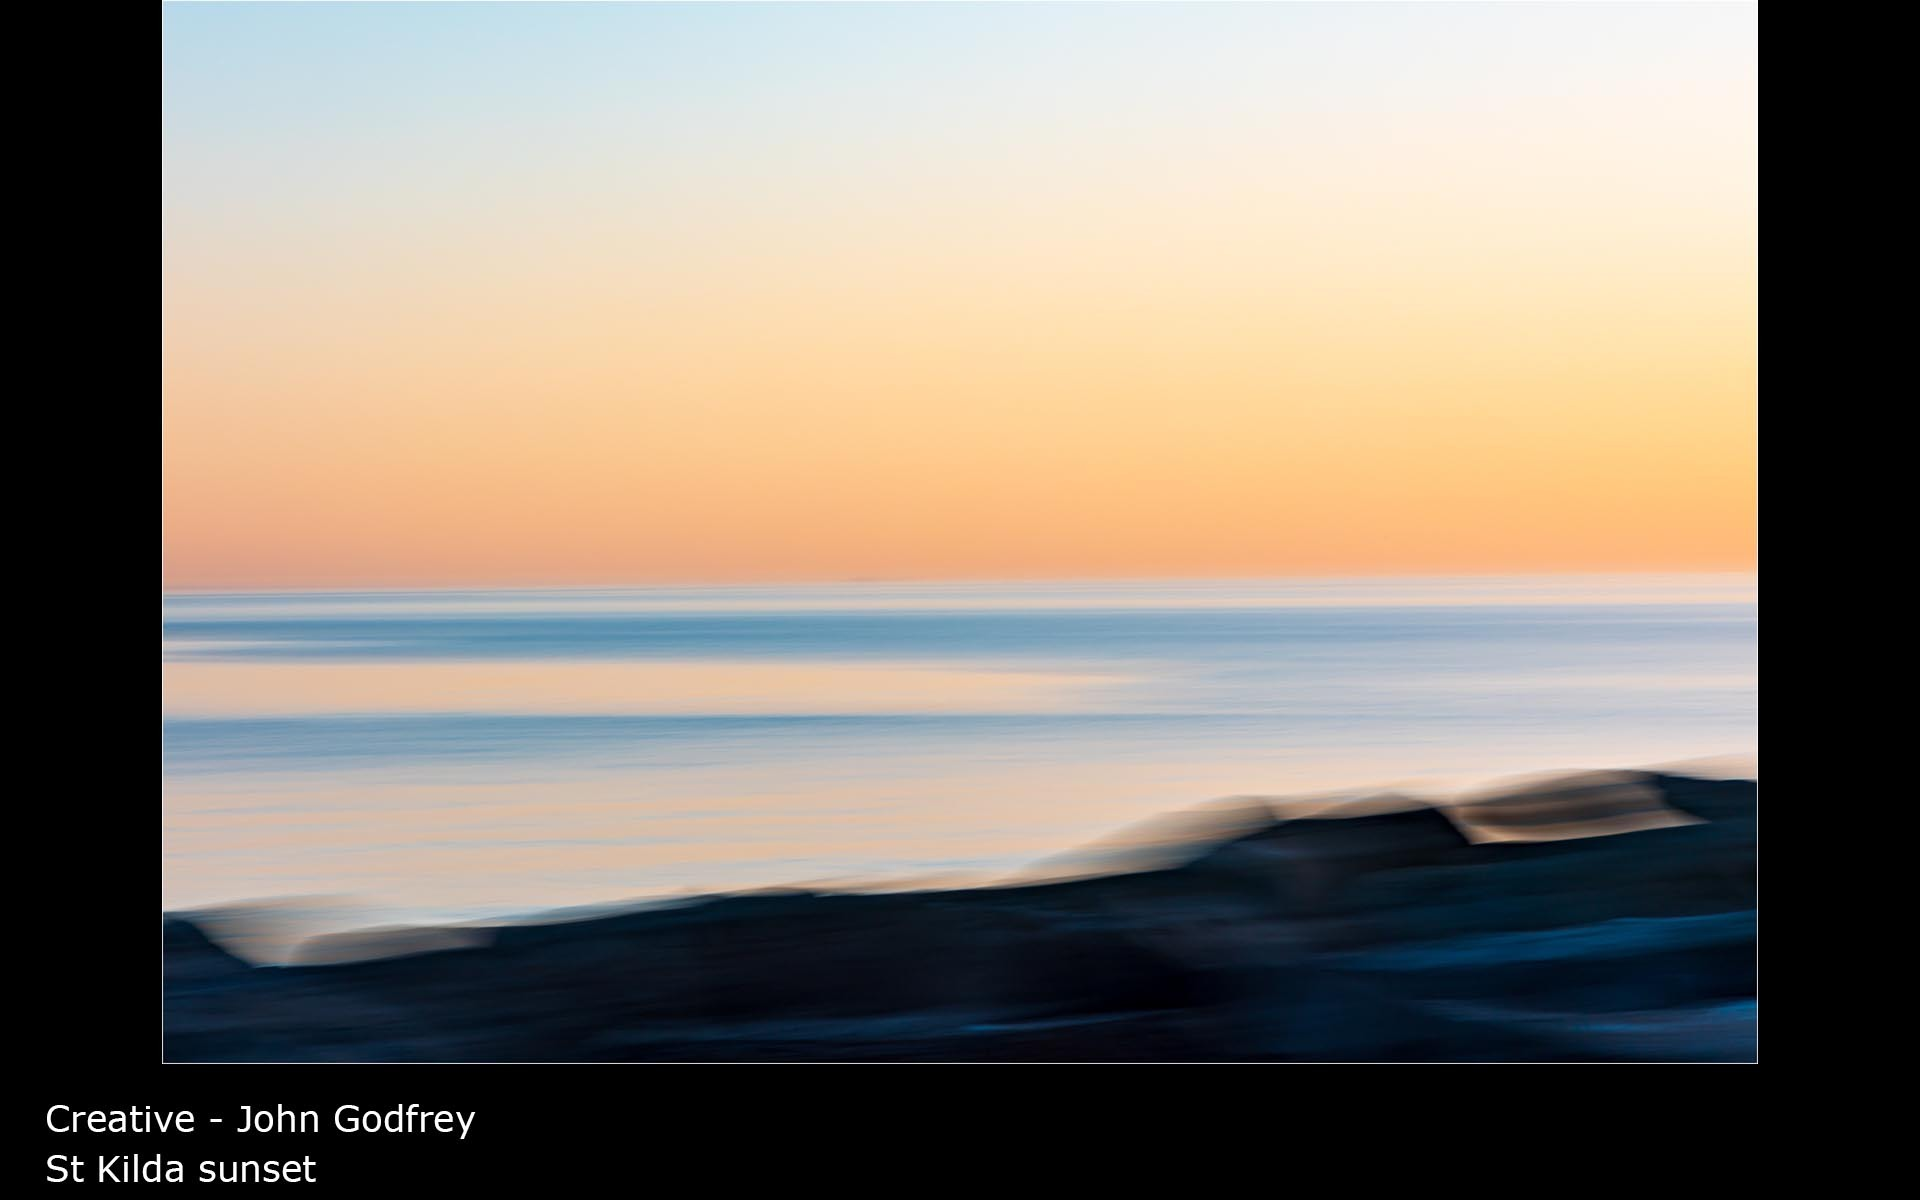 St Kilda sunset - John Godfrey